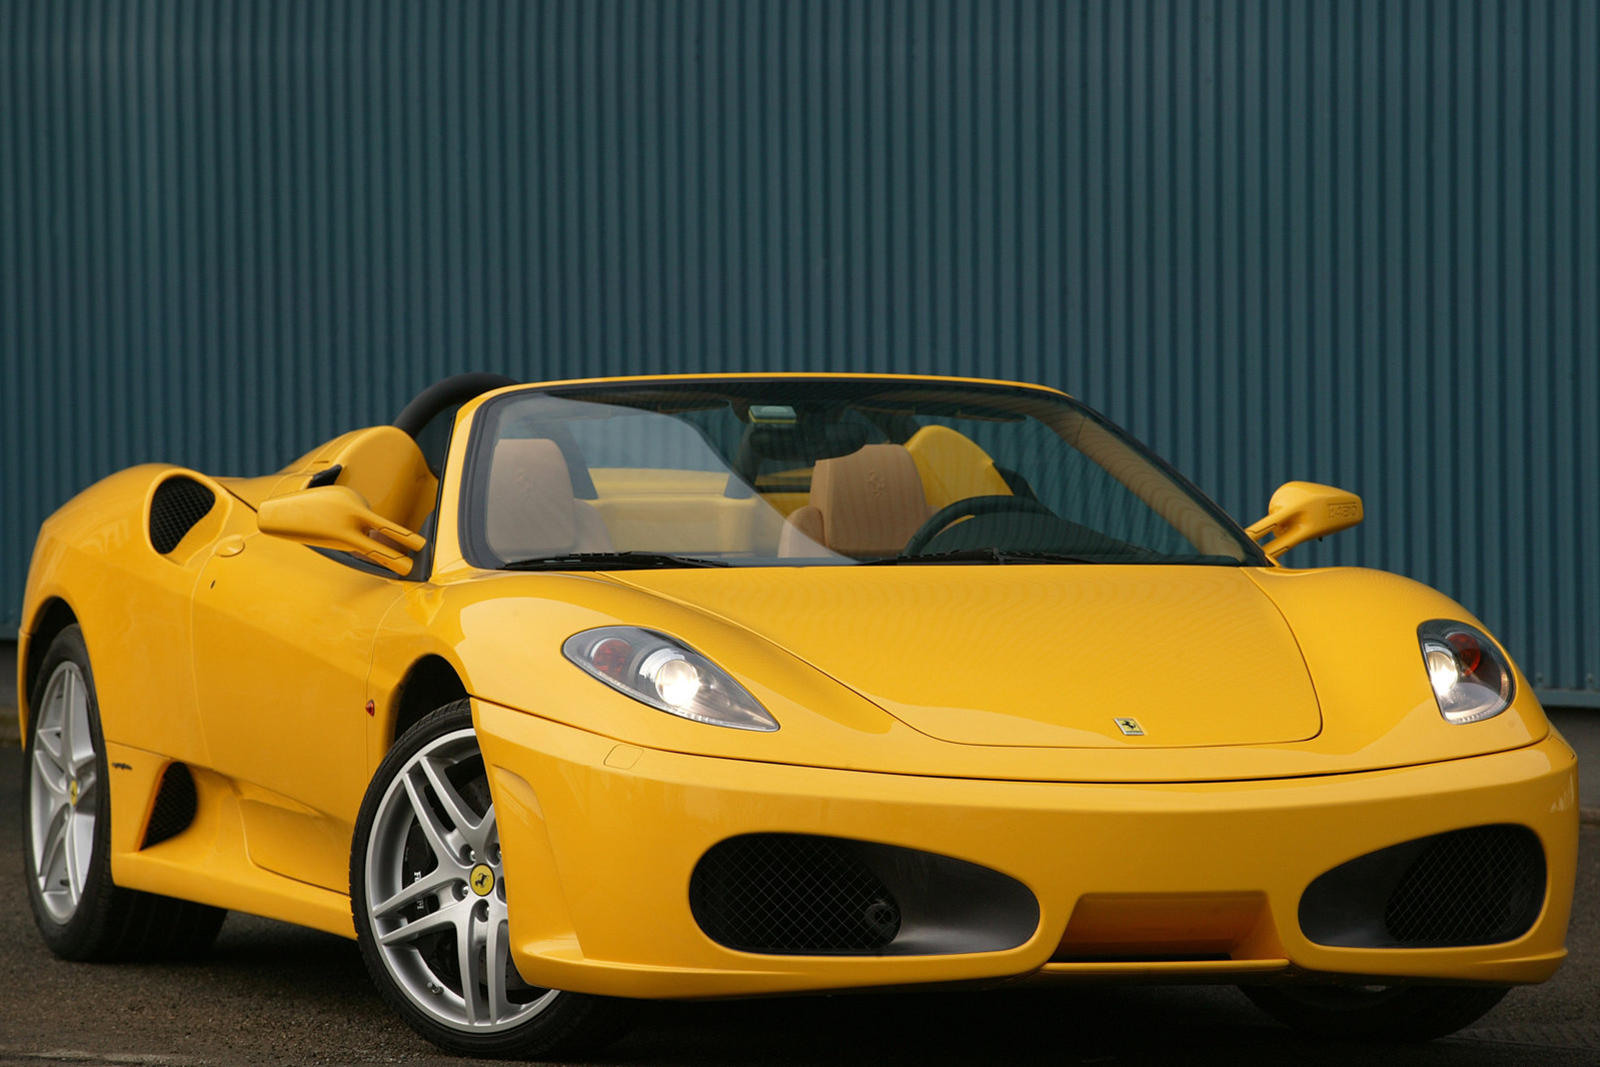 Ferrari F430 Spider Review Trims Specs Price New Interior Features Exterior Design And Specifications Carbuzz